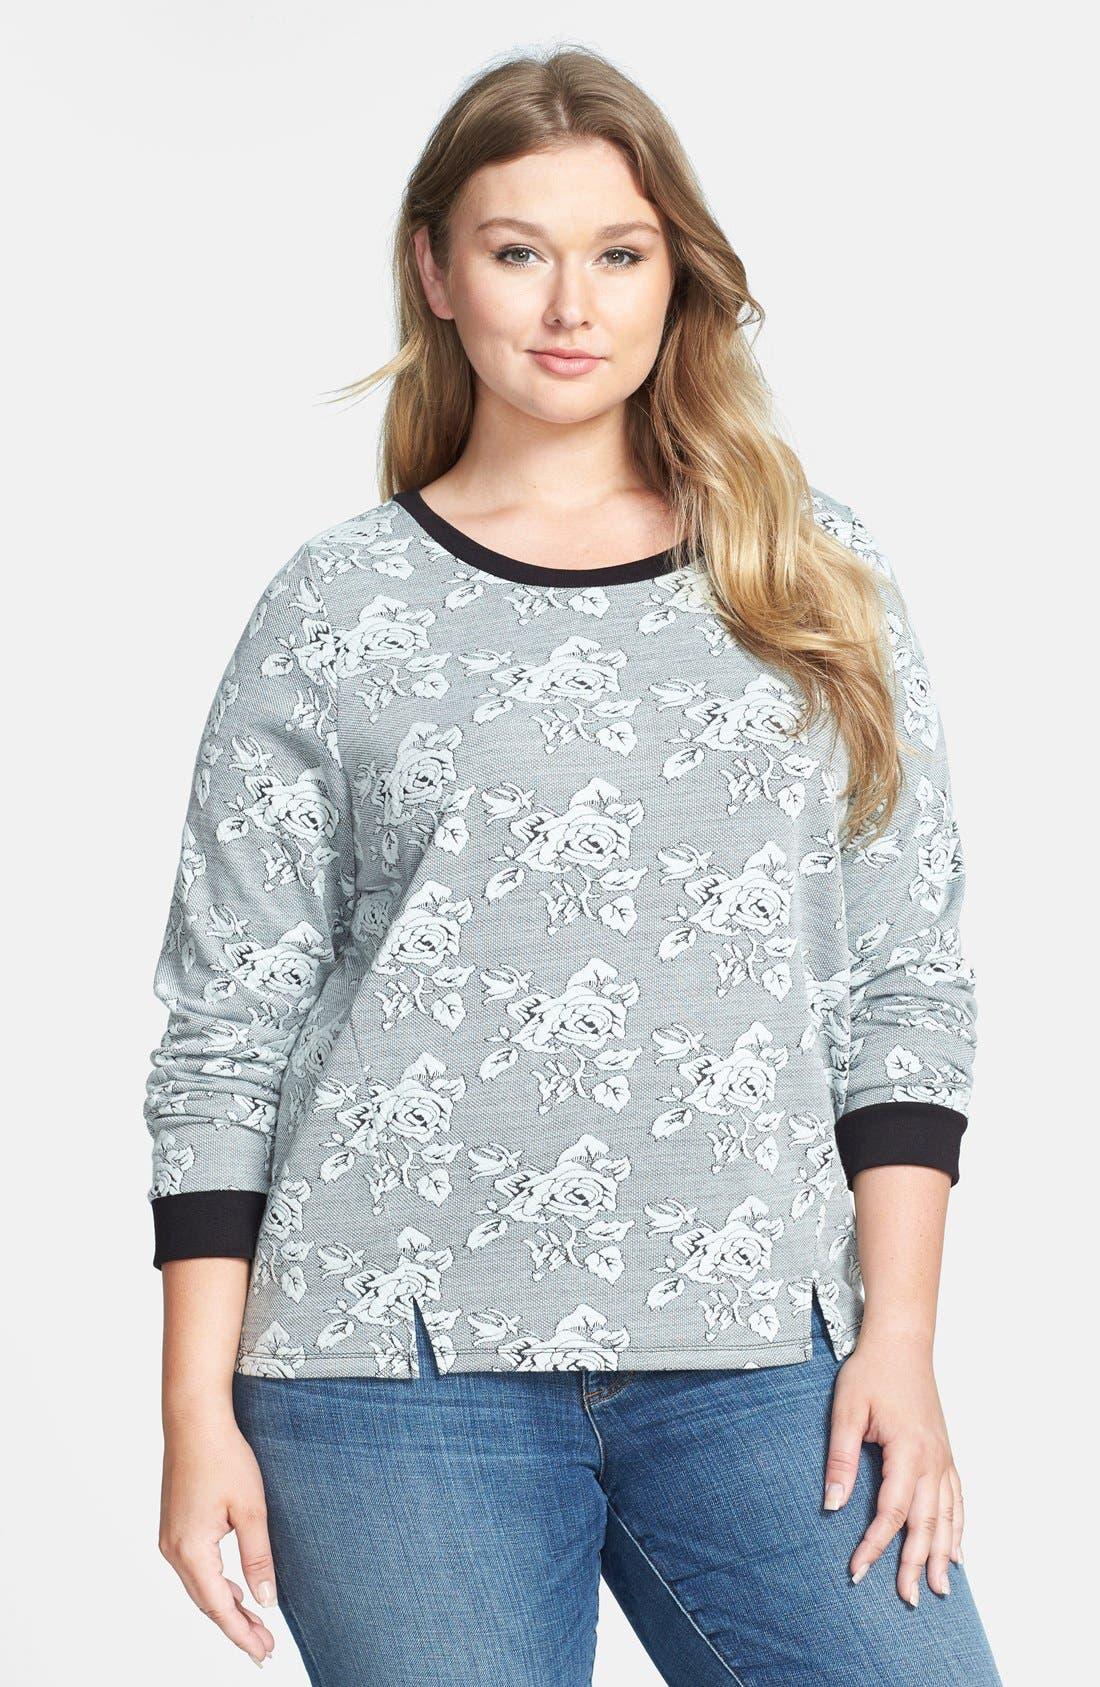 Alternate Image 1 Selected - BB Dakota 'Davi Rose' Jacquard Sweatshirt (Plus Size)